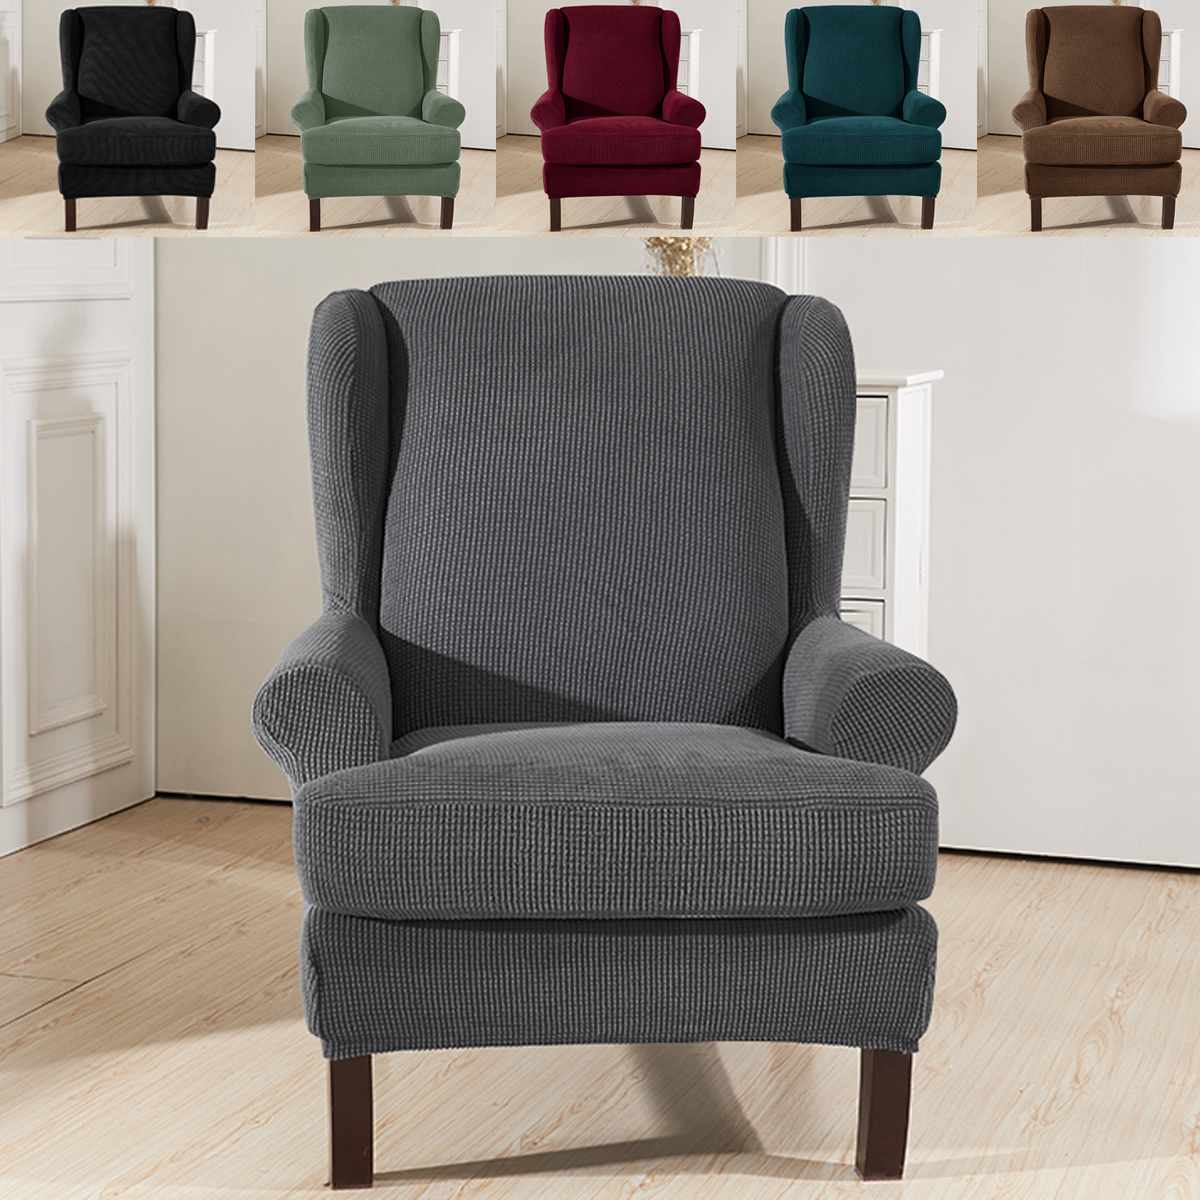 King Back Chair Cover Elastic Armchair